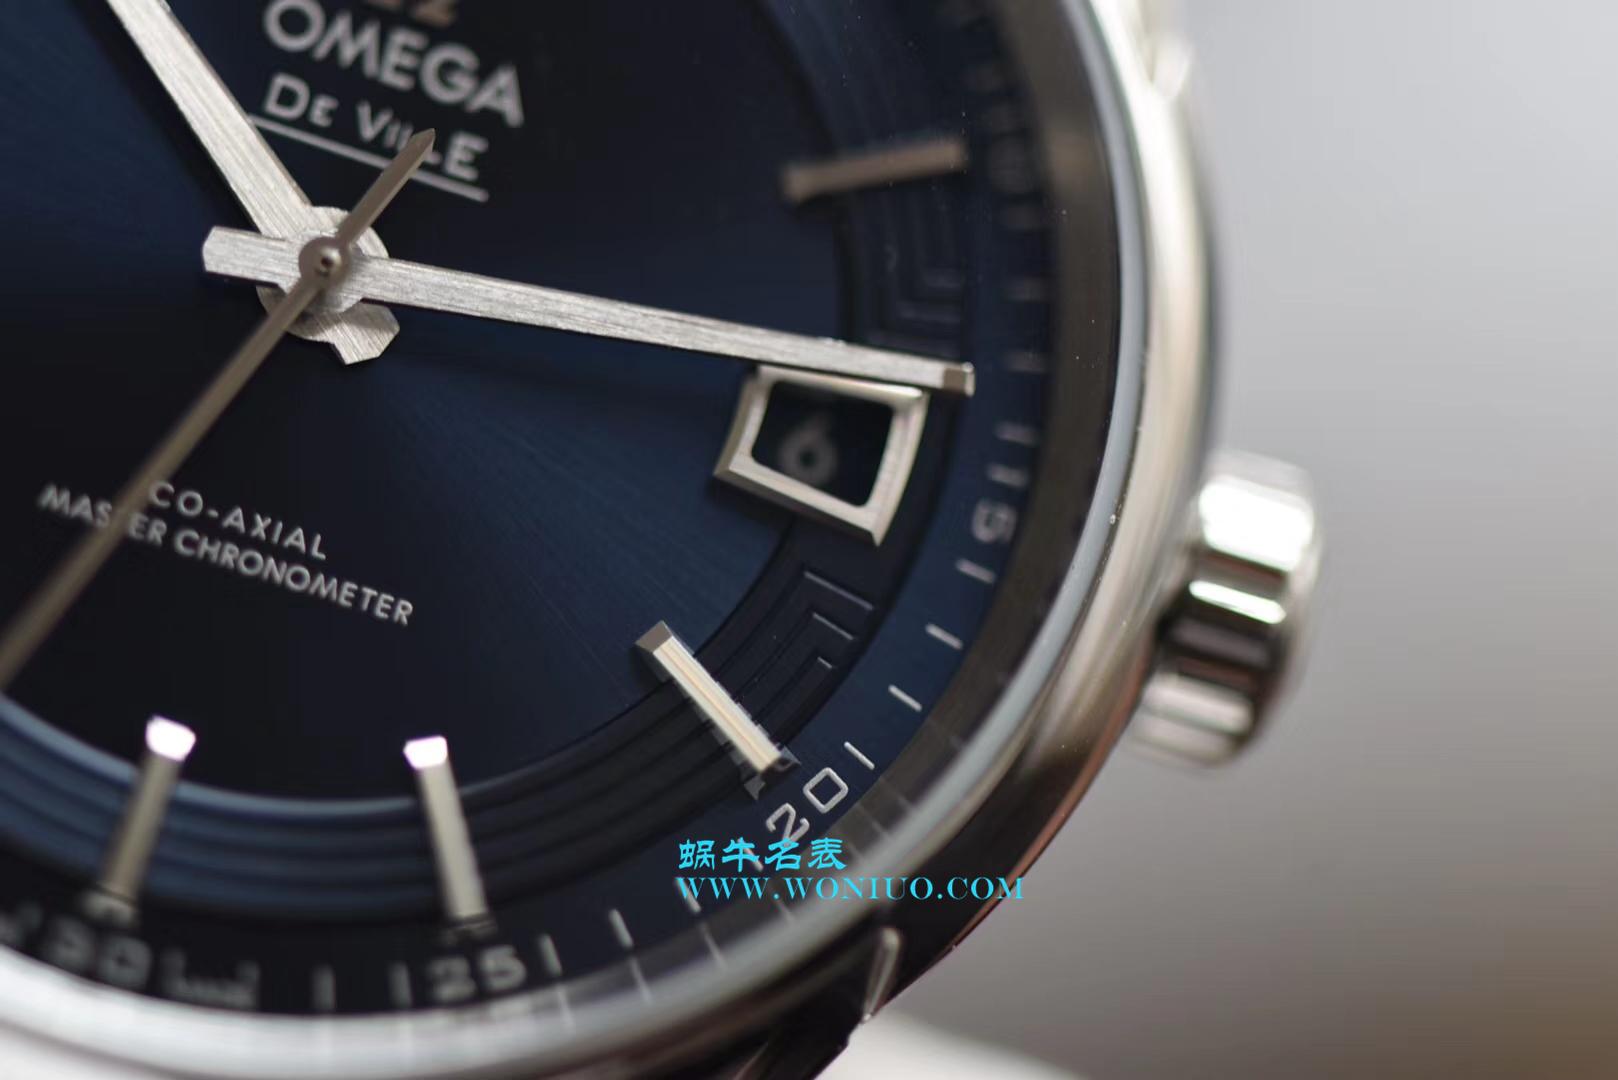 【3S一比一超A高仿手表】欧米茄碟飞HOUR VISION腕表系列433.33.41.21.03.001腕表(明亮之蓝)  / M316